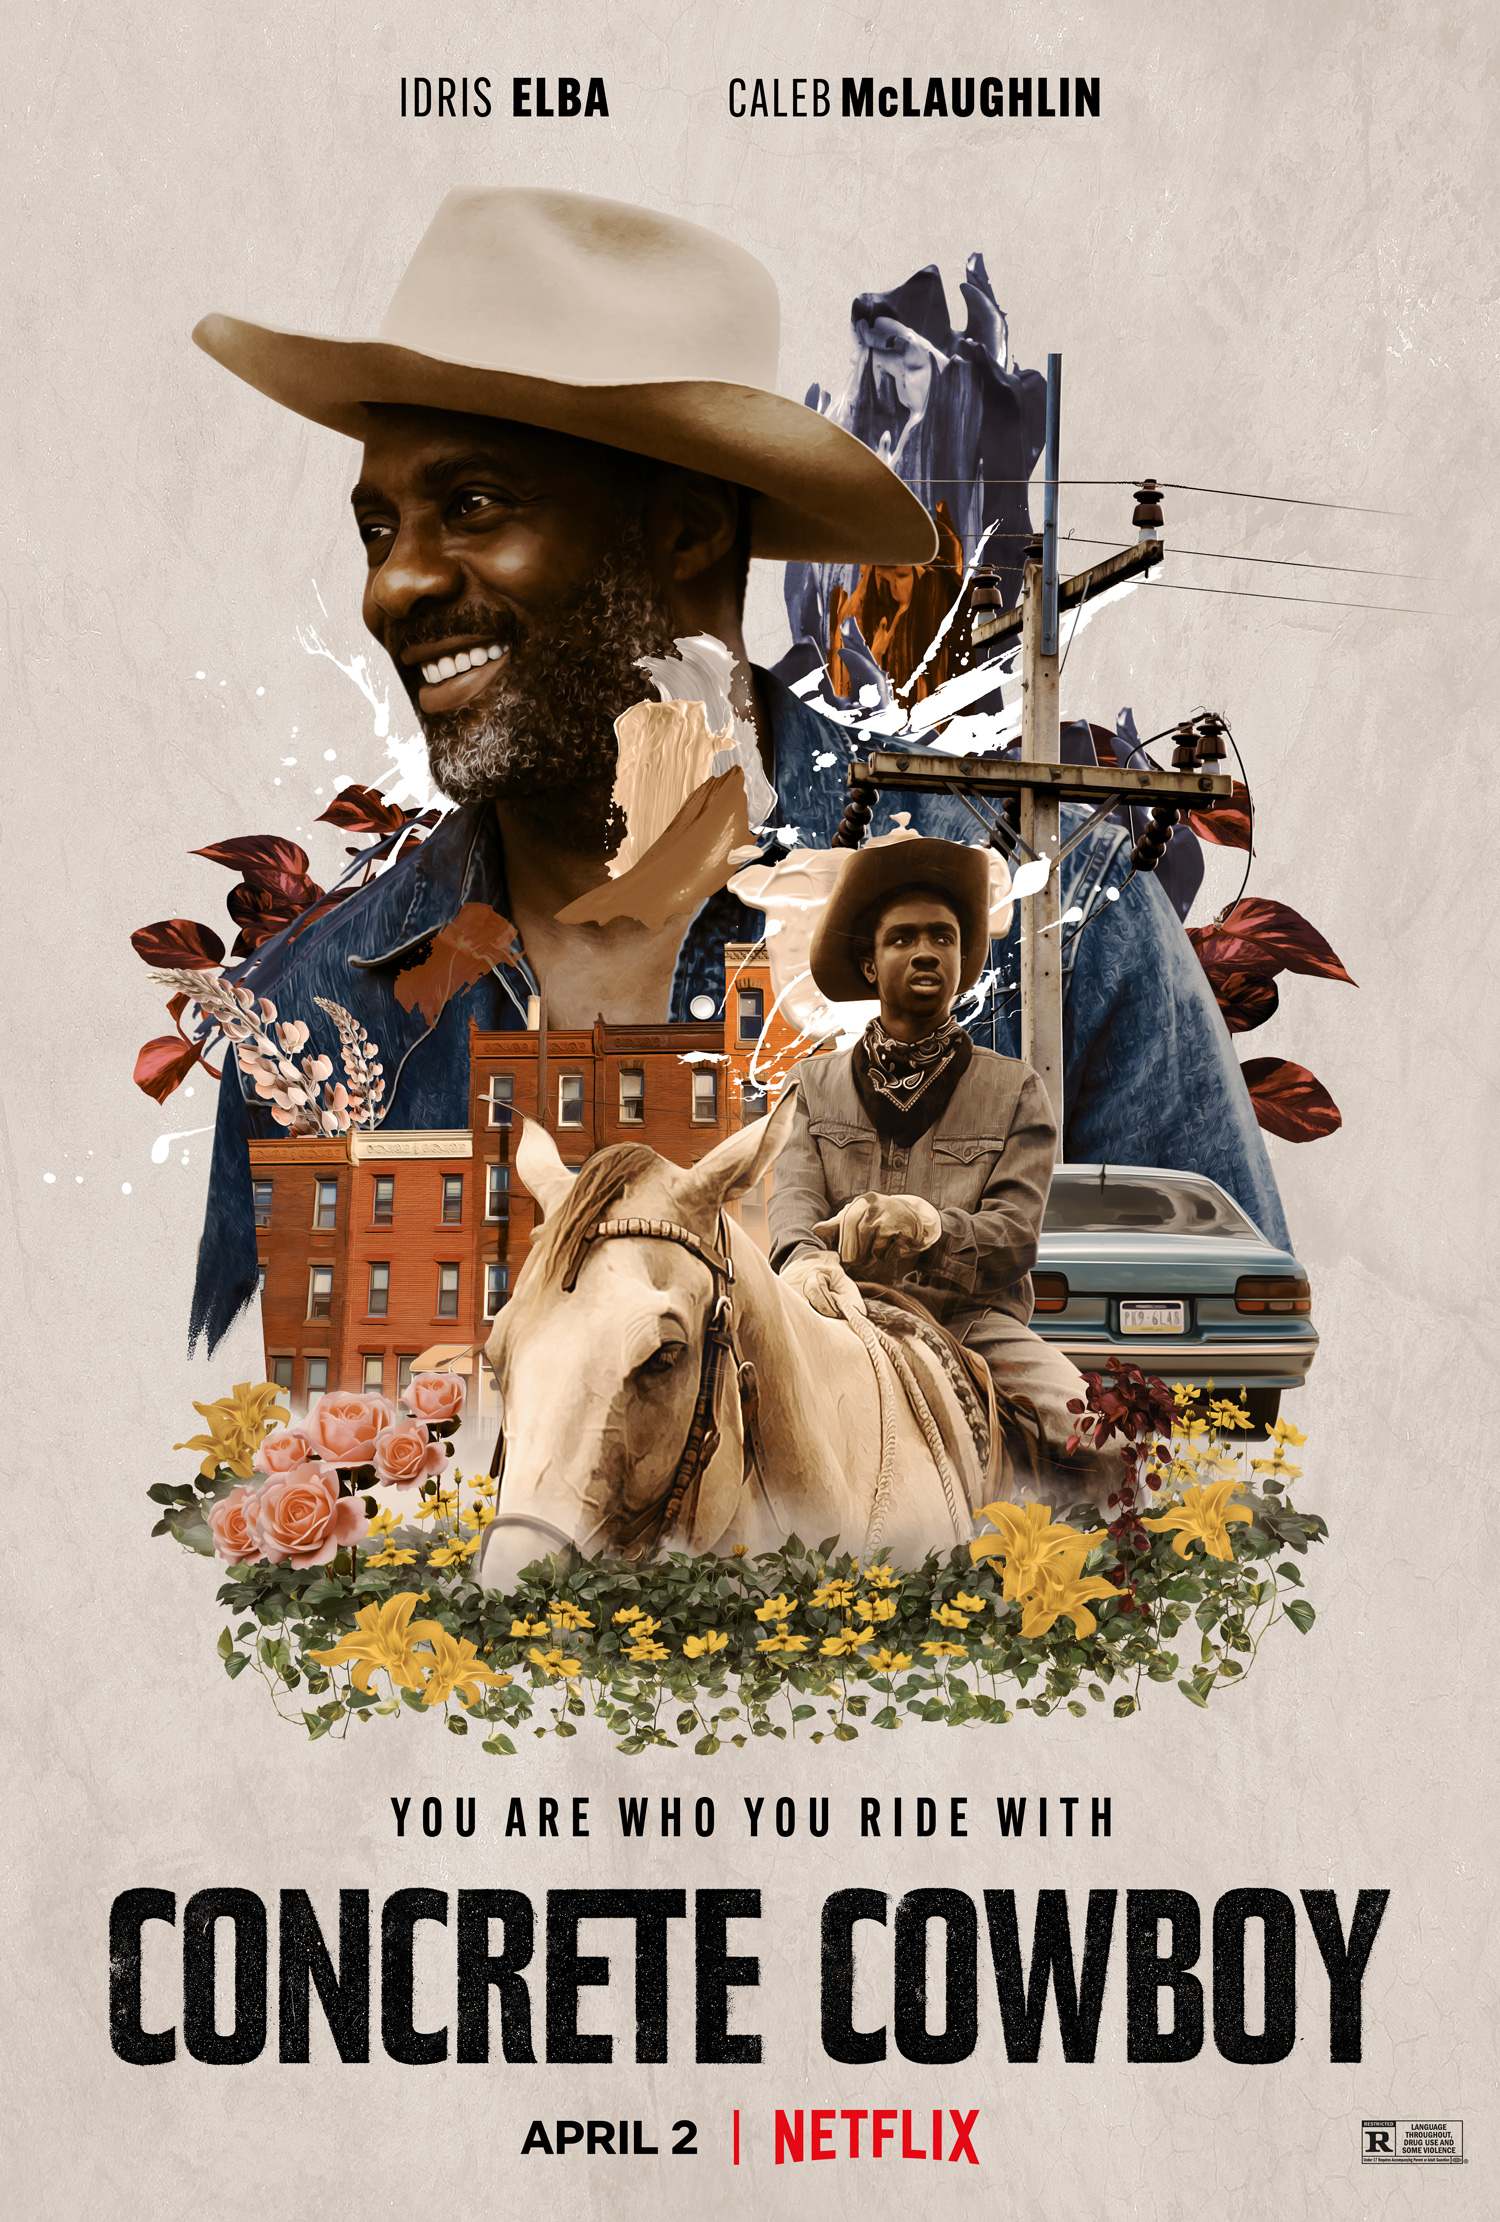 New Movie: Concrete Cowboy Starring Idris Elba And Caleb McLaughlin